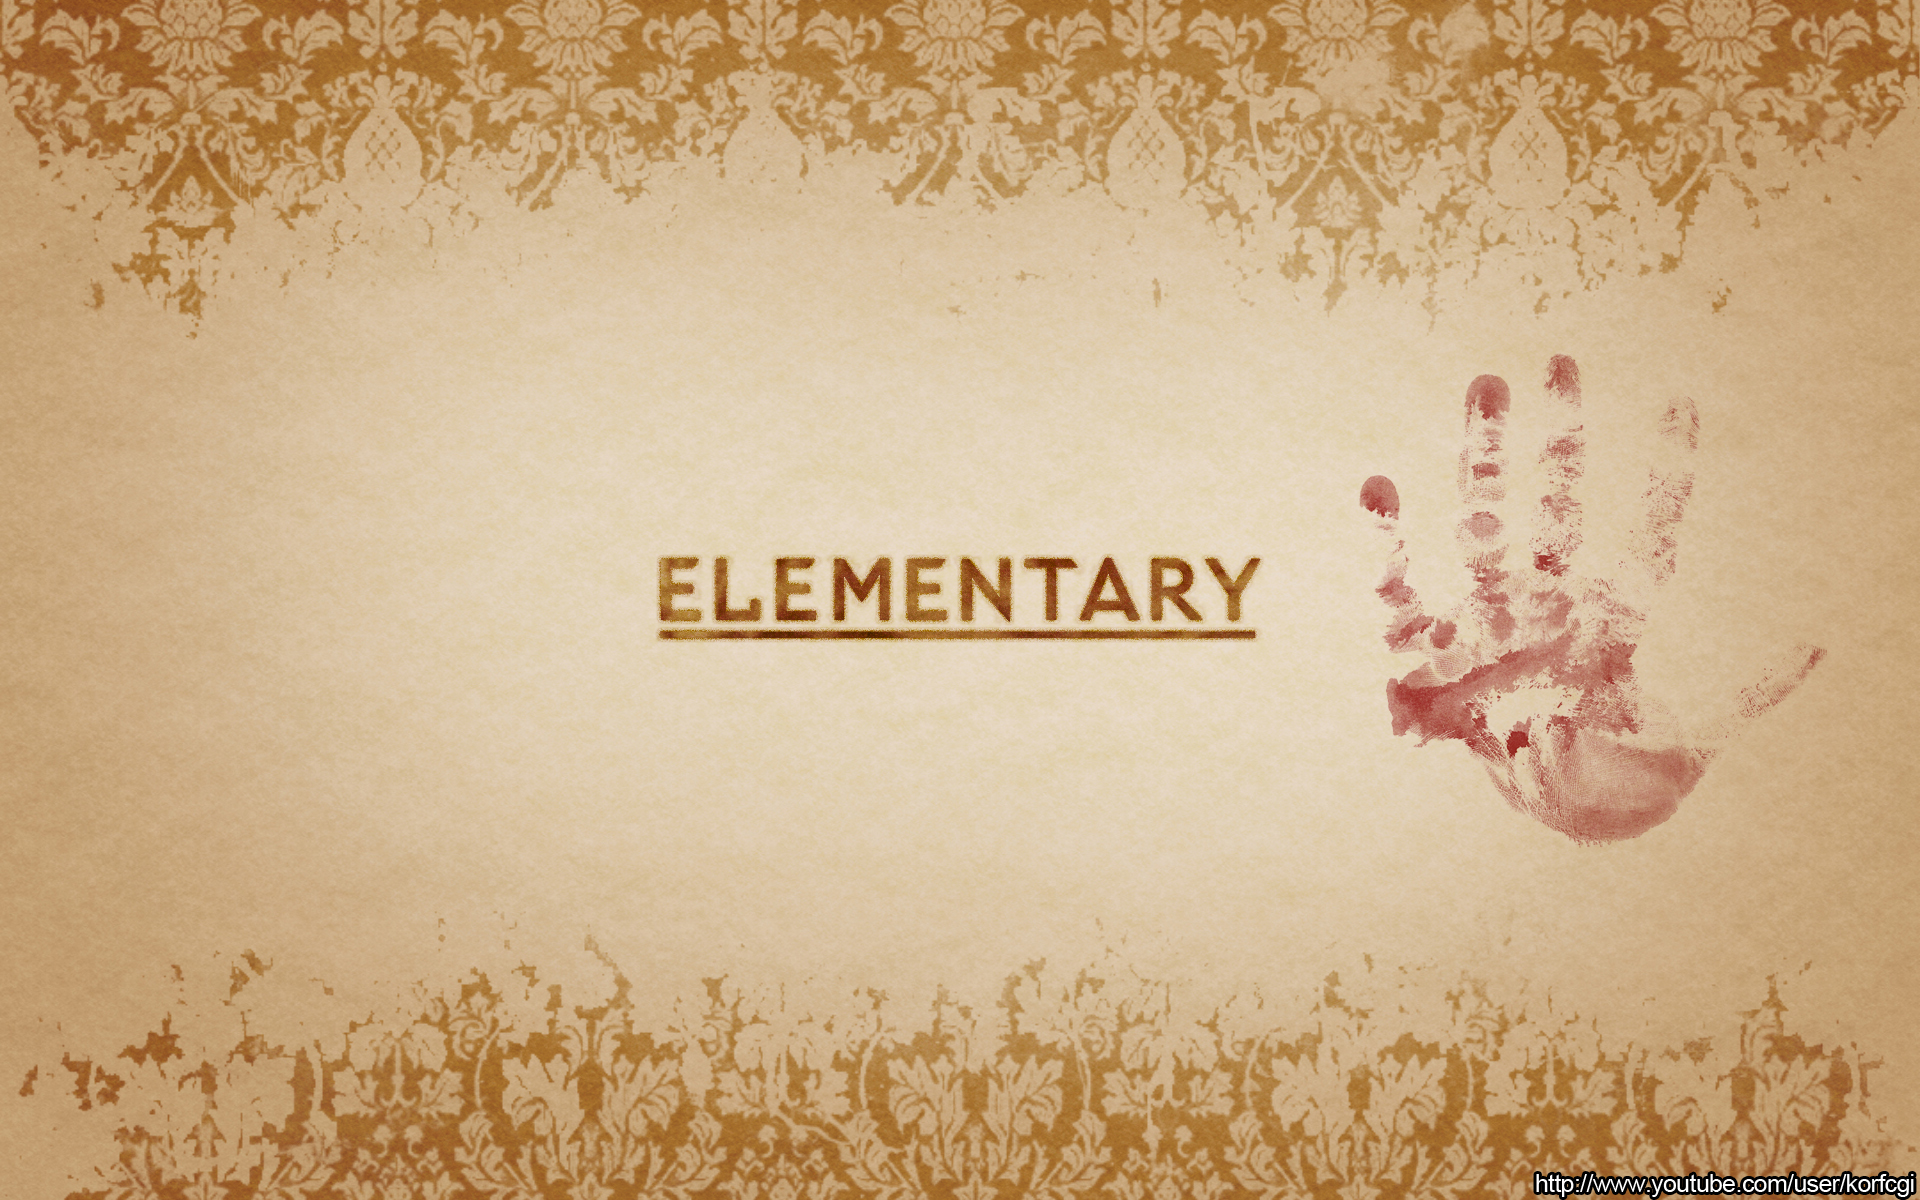 Elementary wallpaper by KorfCGI